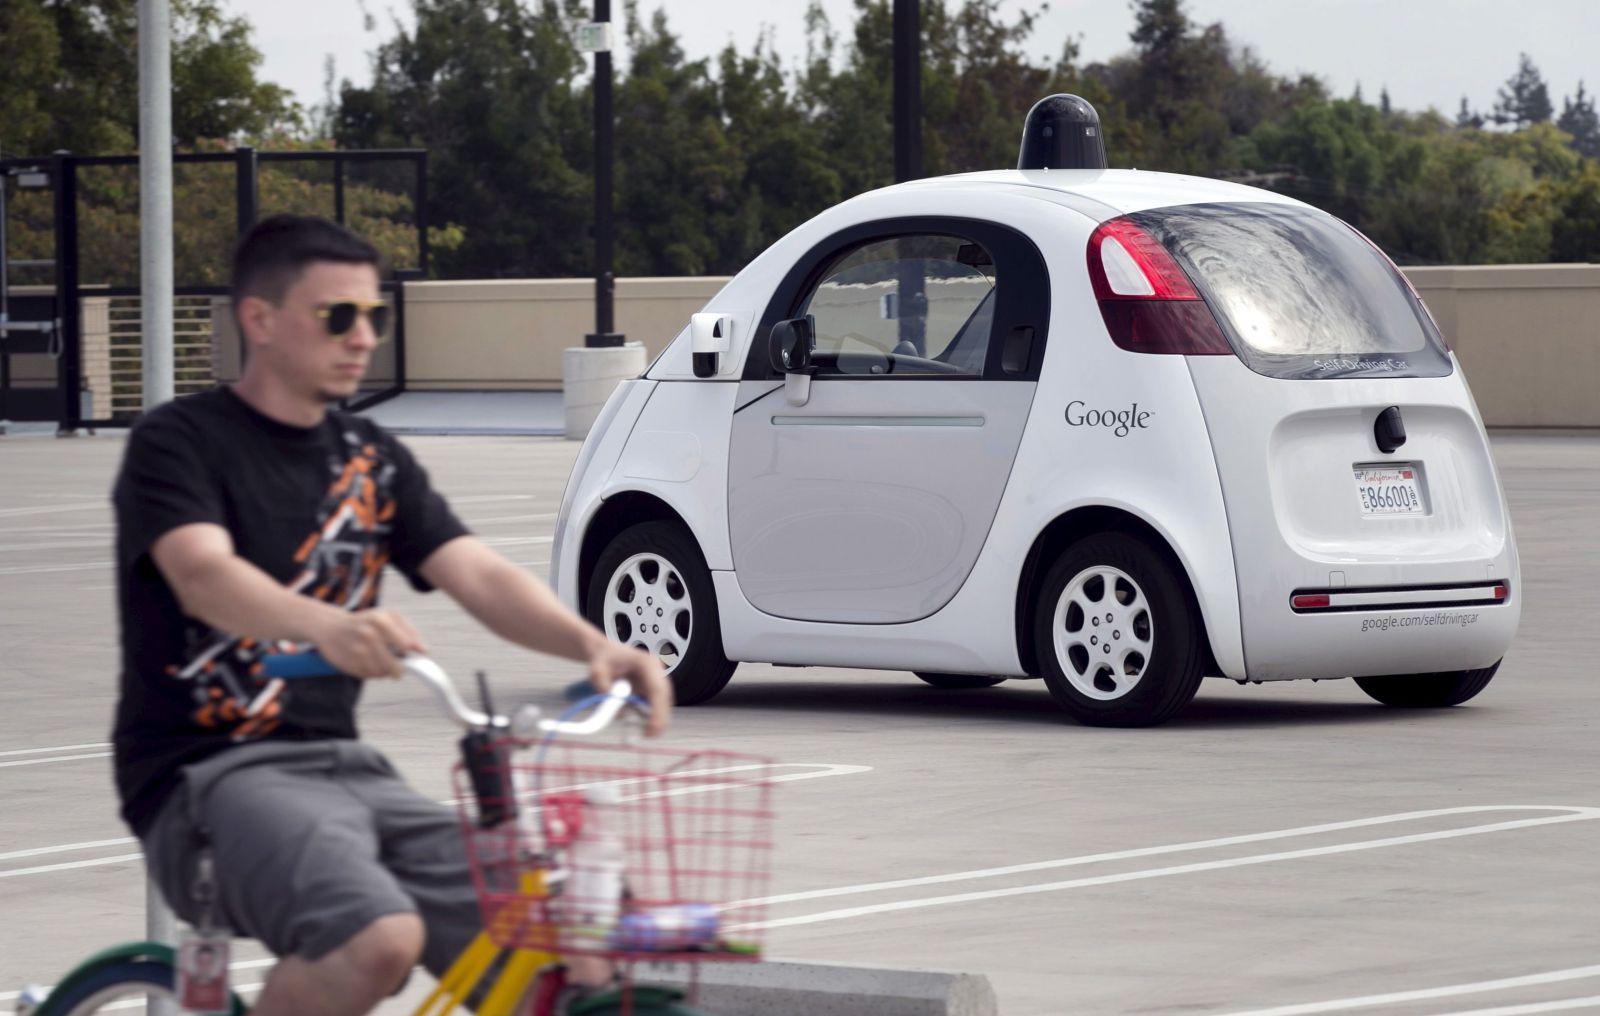 Google is launching its own ridesharing service—Uber, Lyft